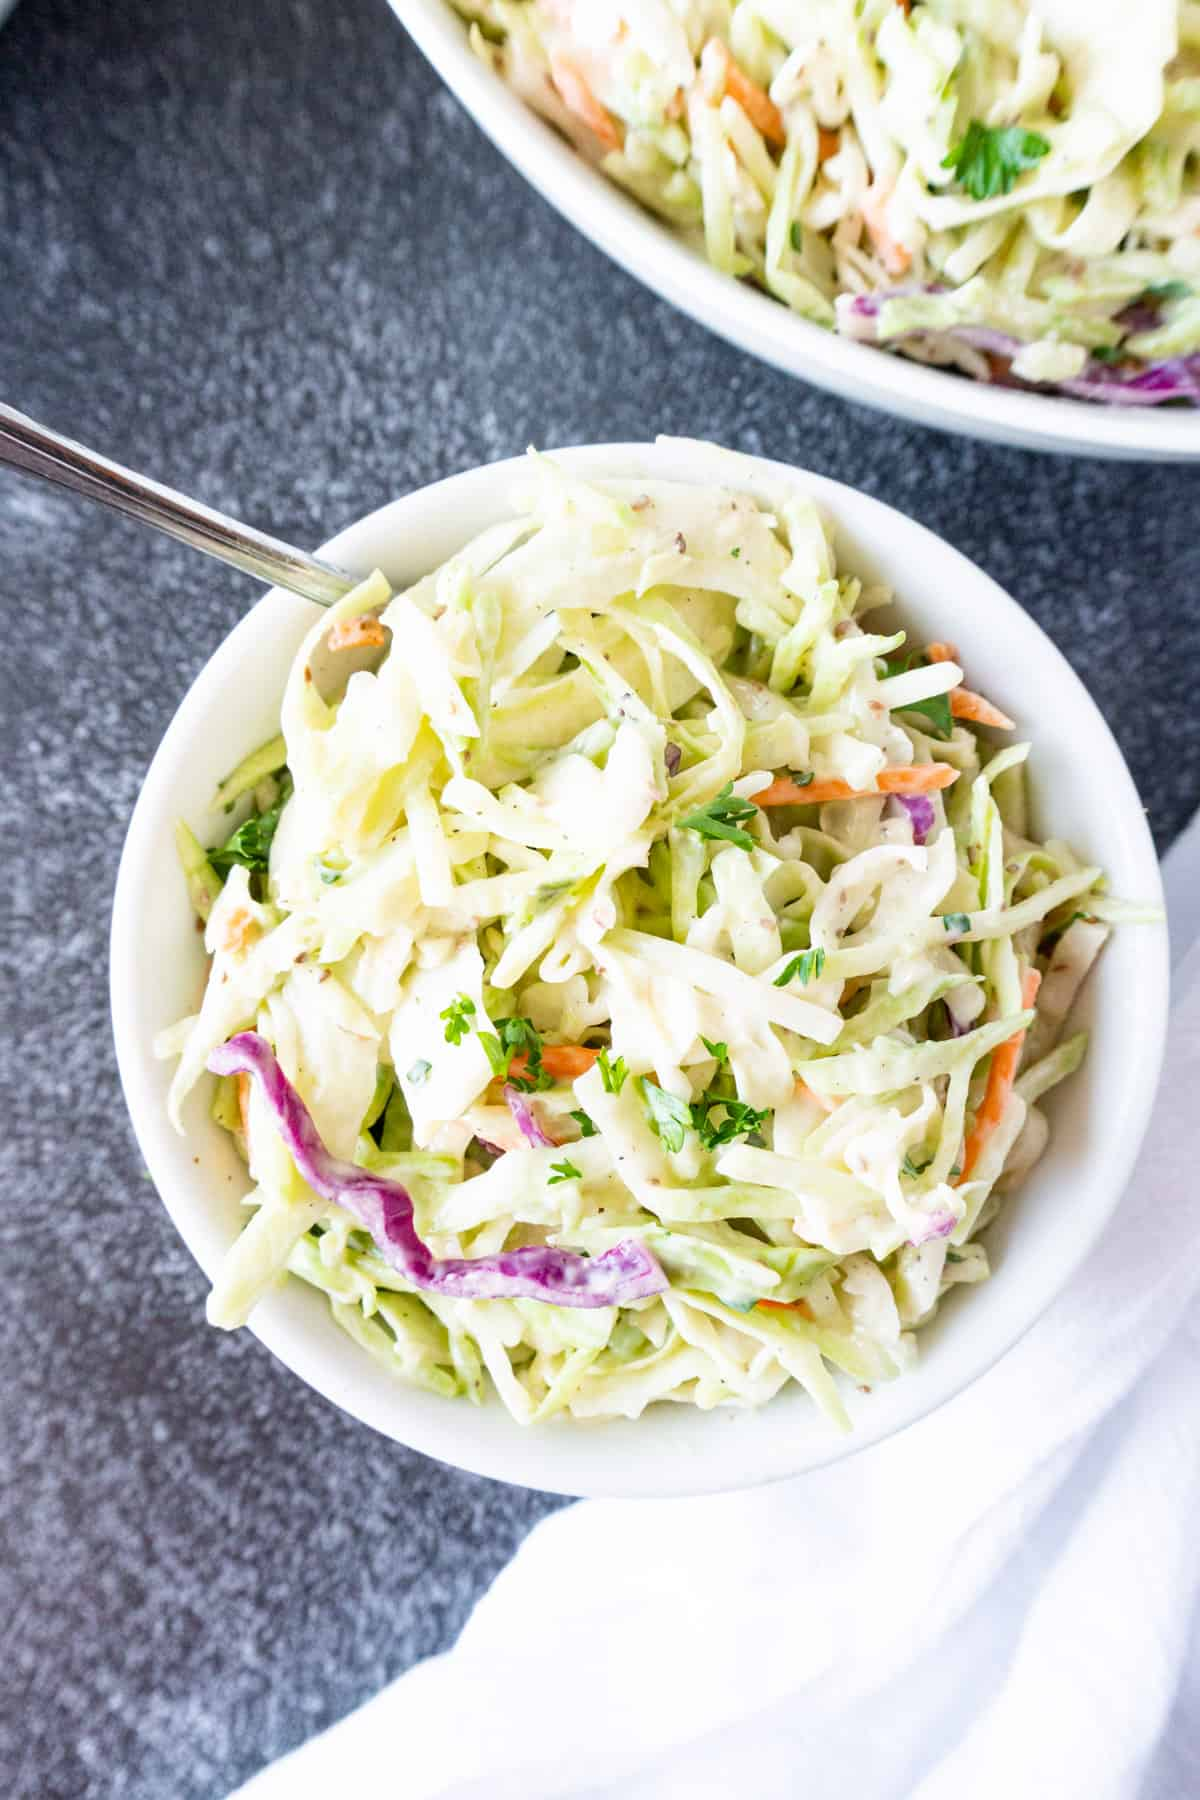 broccoli slaw in small white bowl